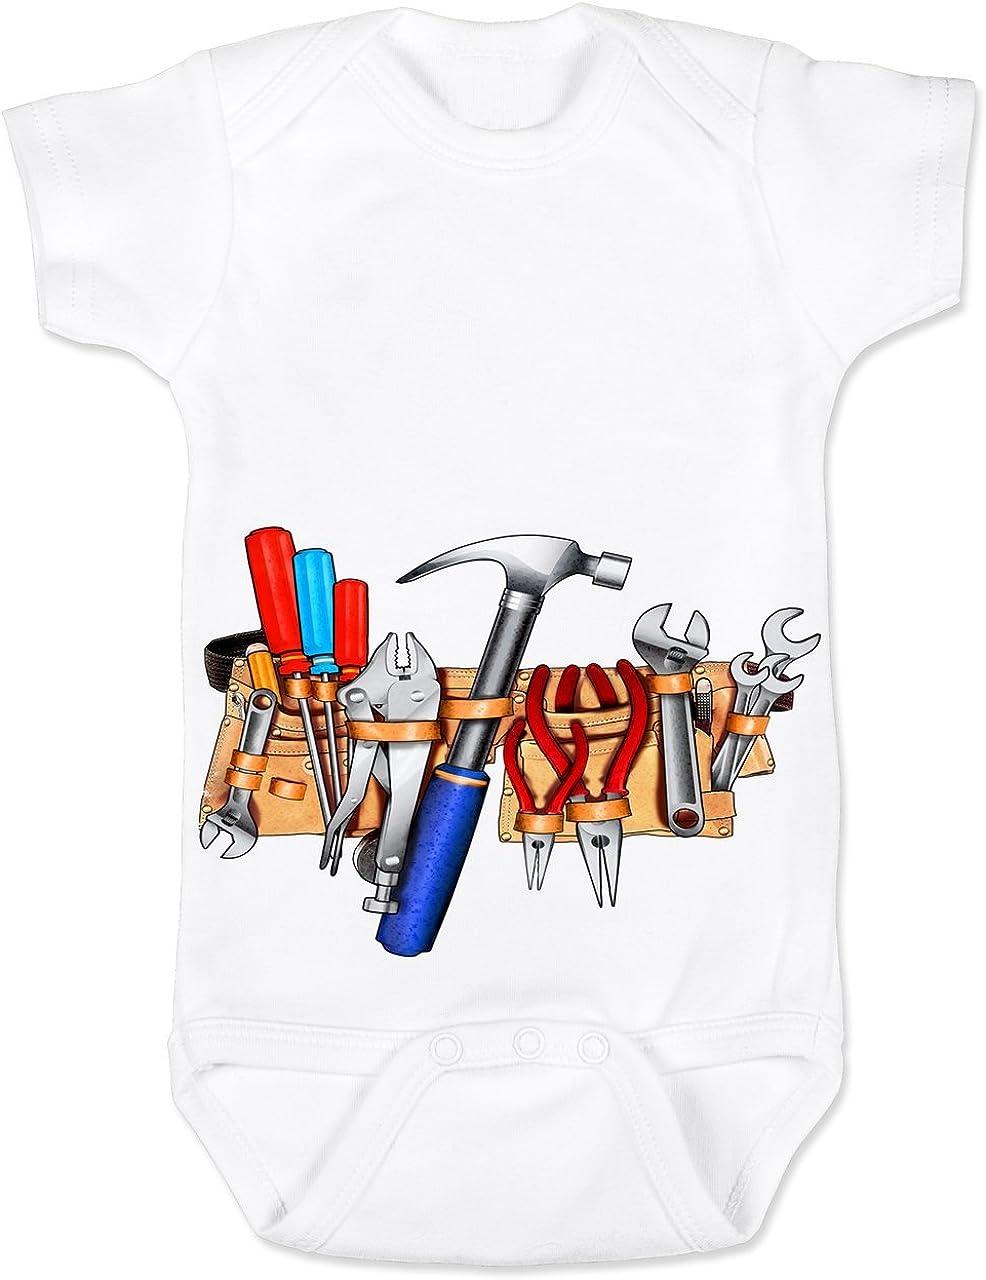 Vulgar Baby Bodysuit Tool Belt